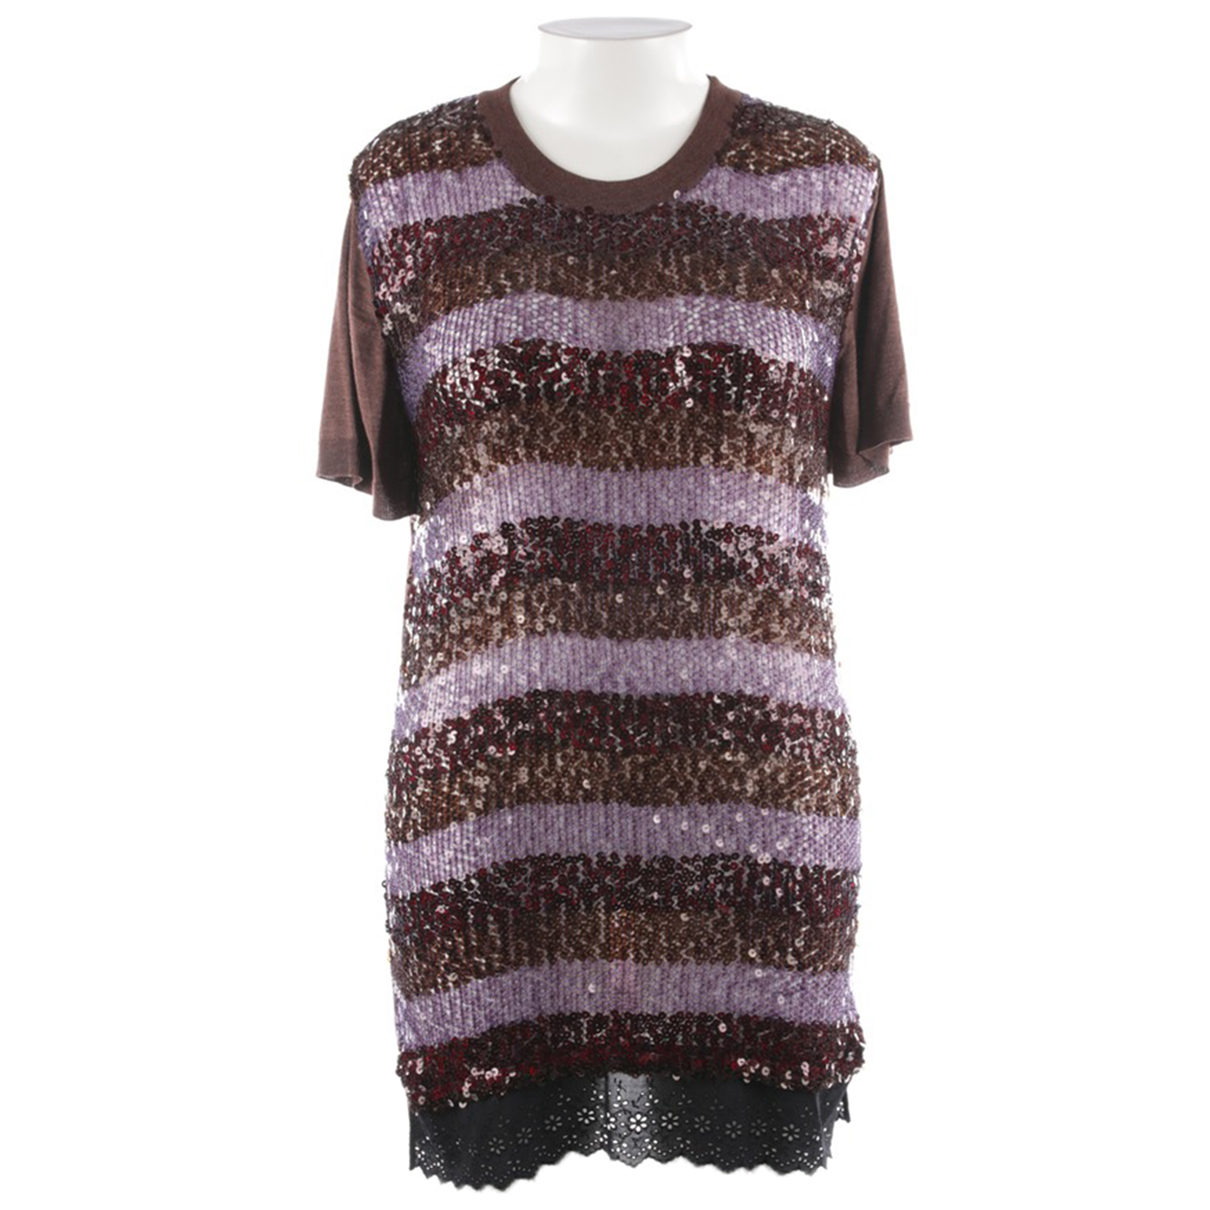 Louis Vuitton \N Kleid in  Braun Kaschmir